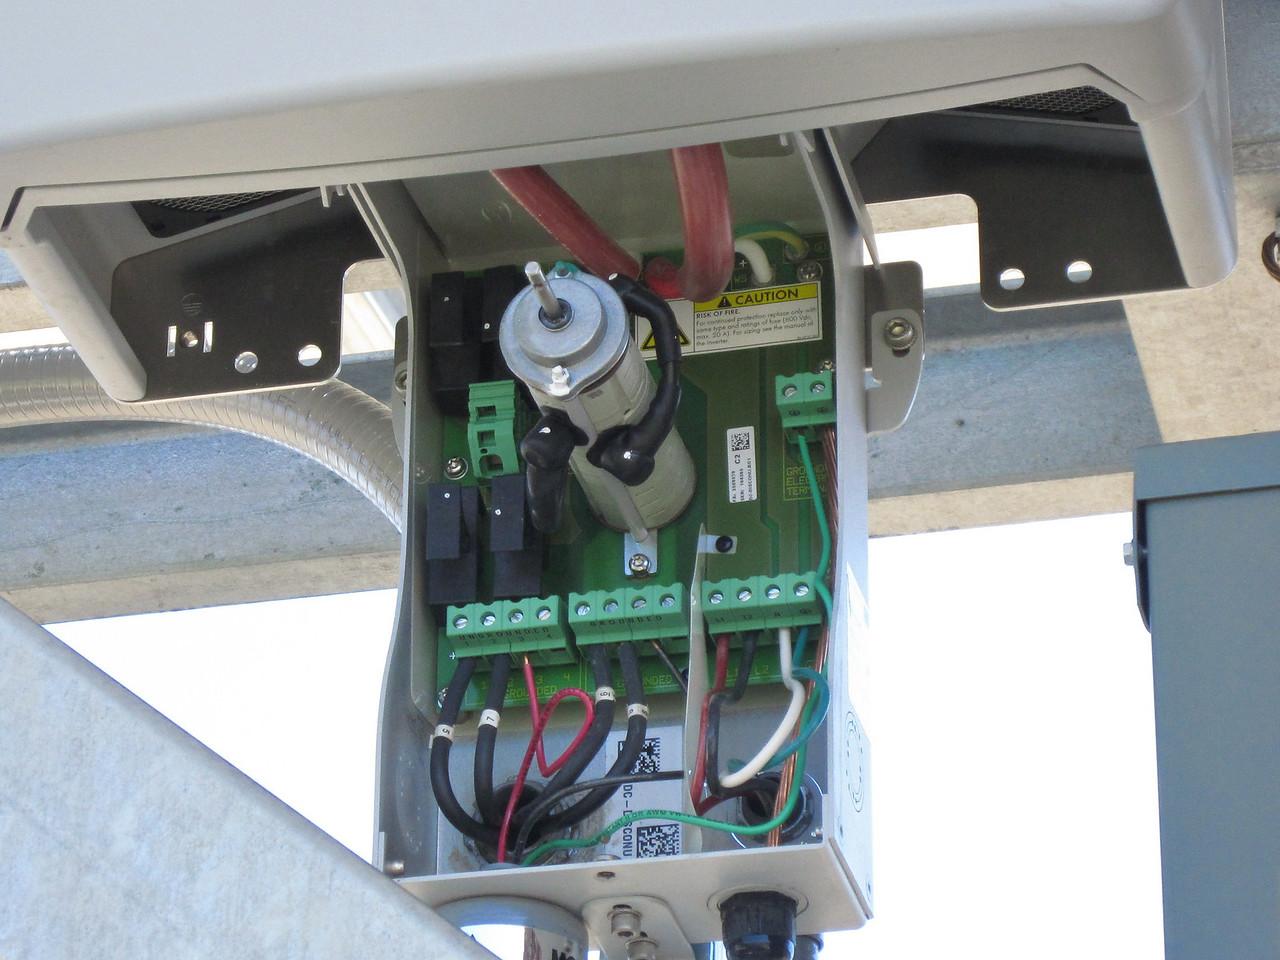 Inside the inverter power supply/switch box.